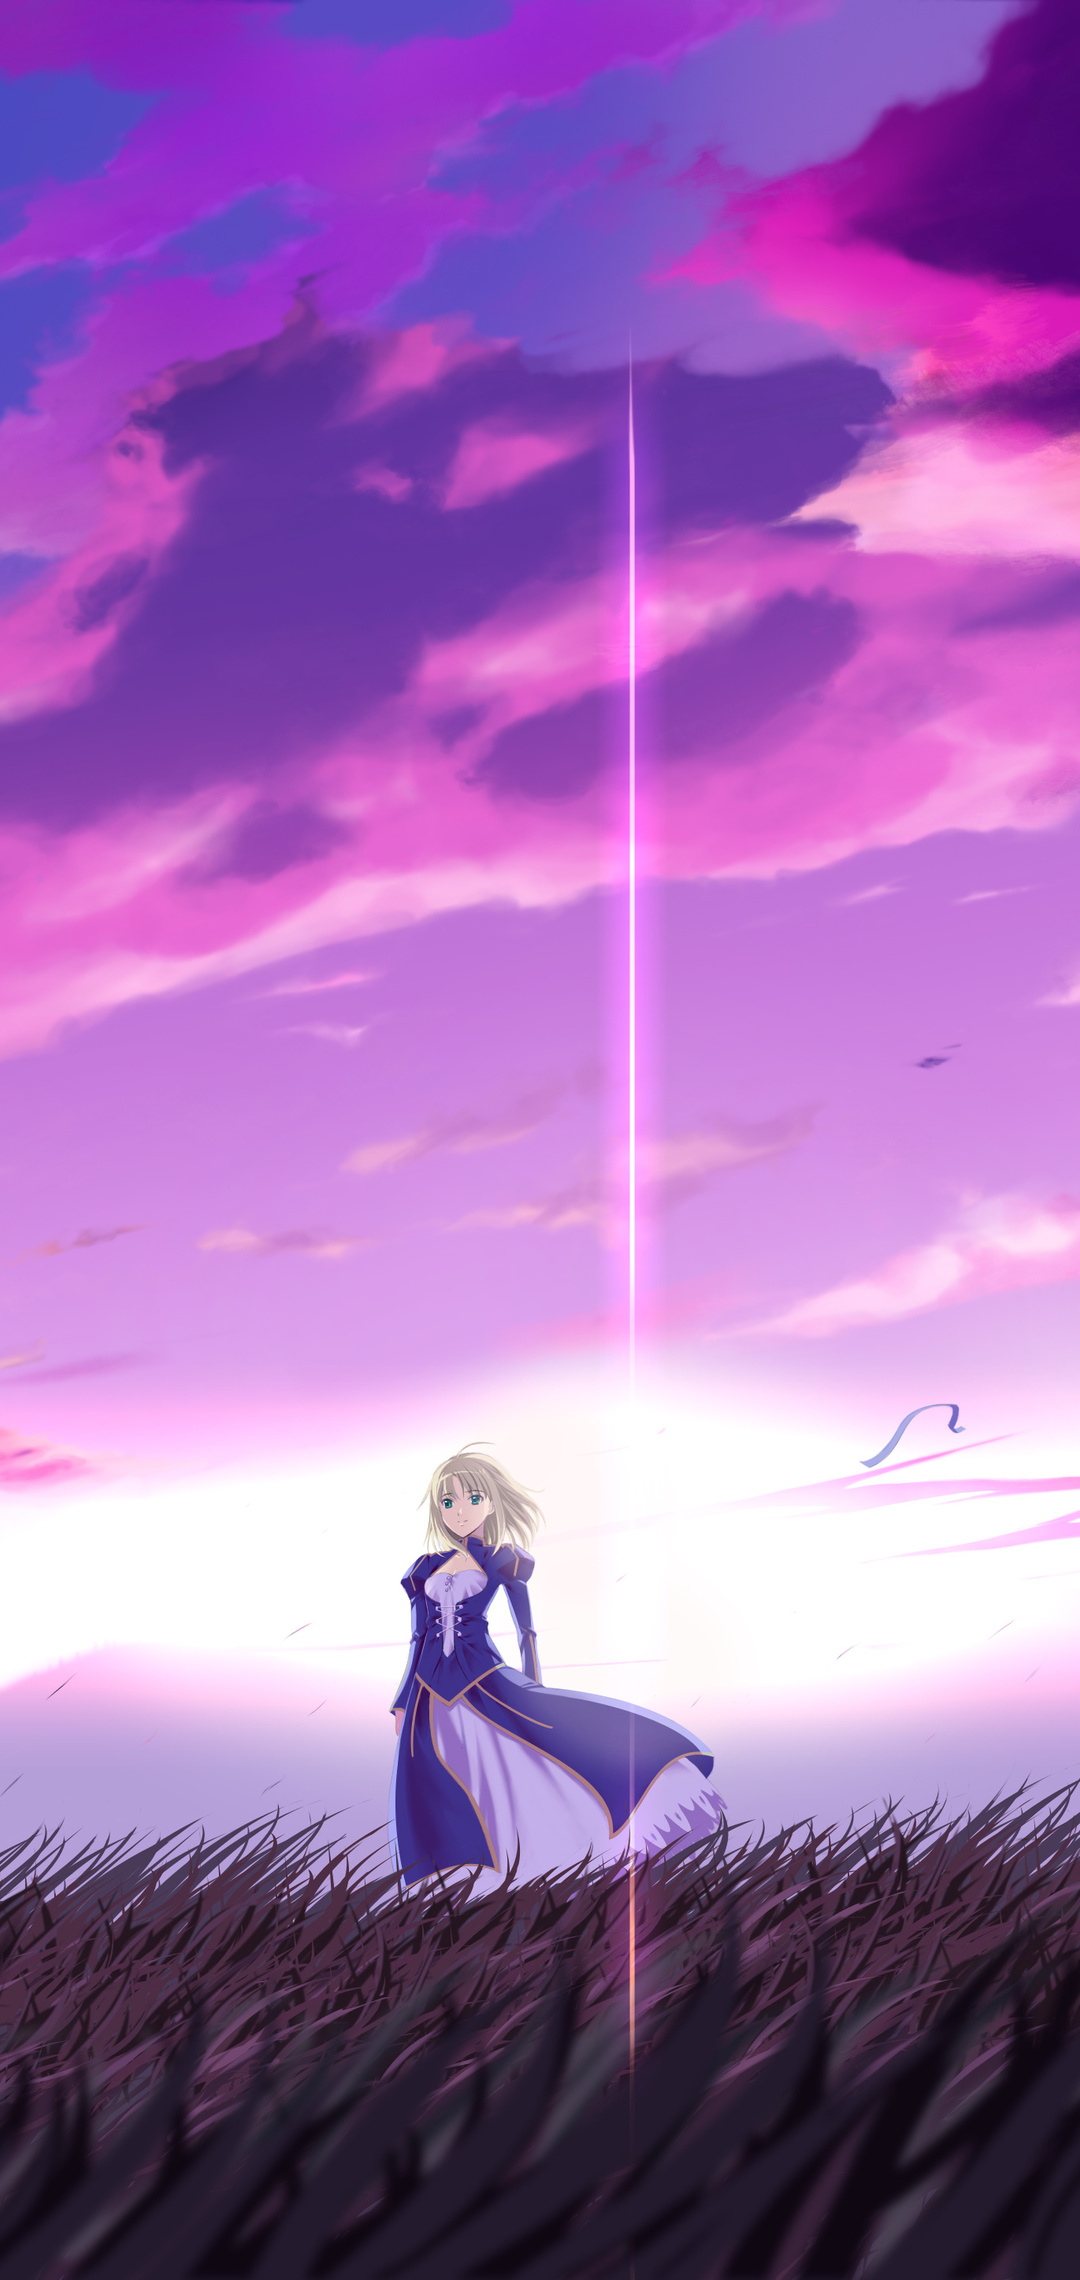 1080x2280 Anime Fate Stay Night 4k One Plus 6,Huawei p20 ...